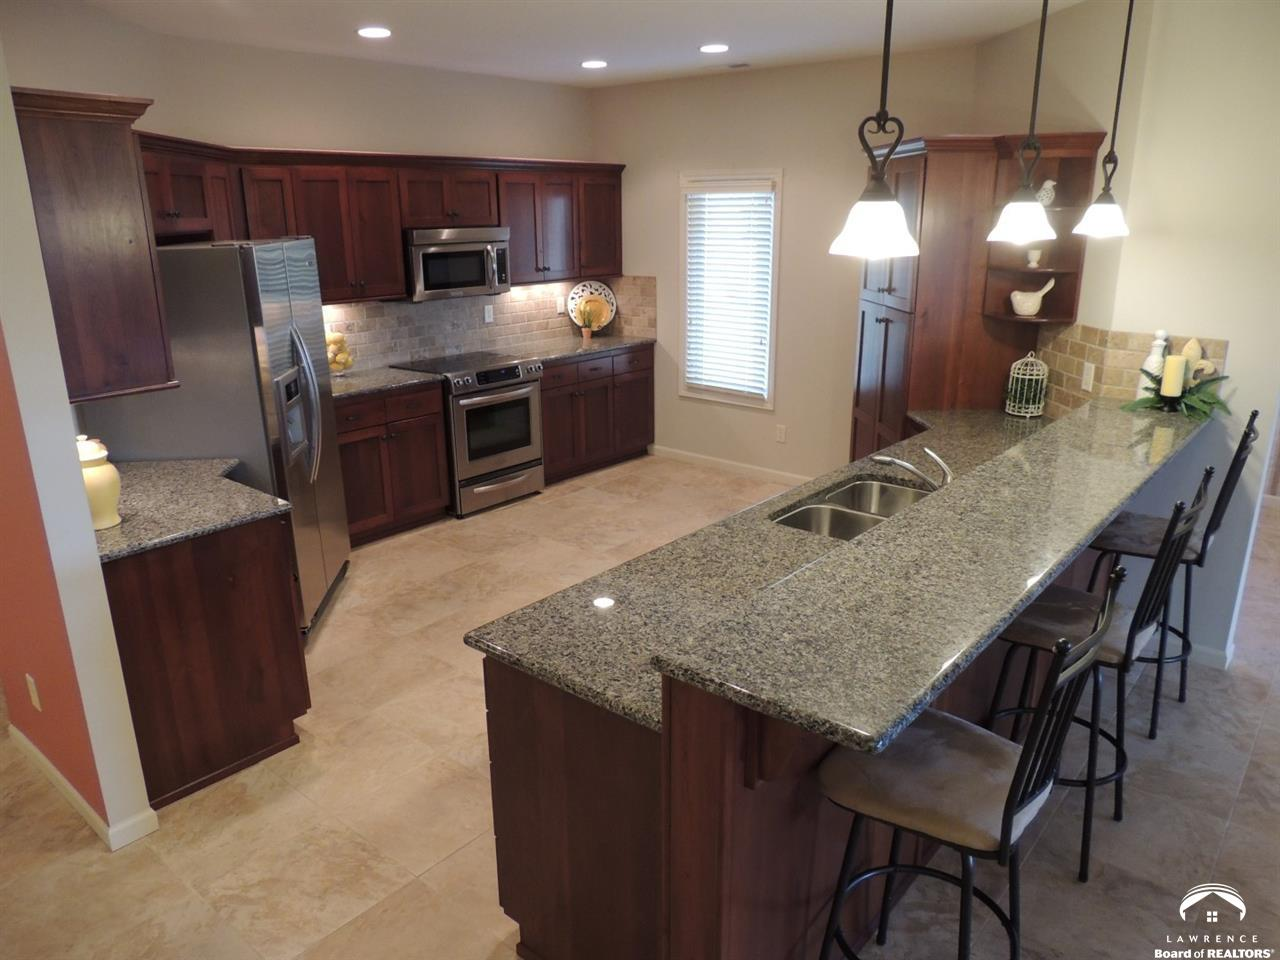 Kitchen Countertops Lawrence Ks